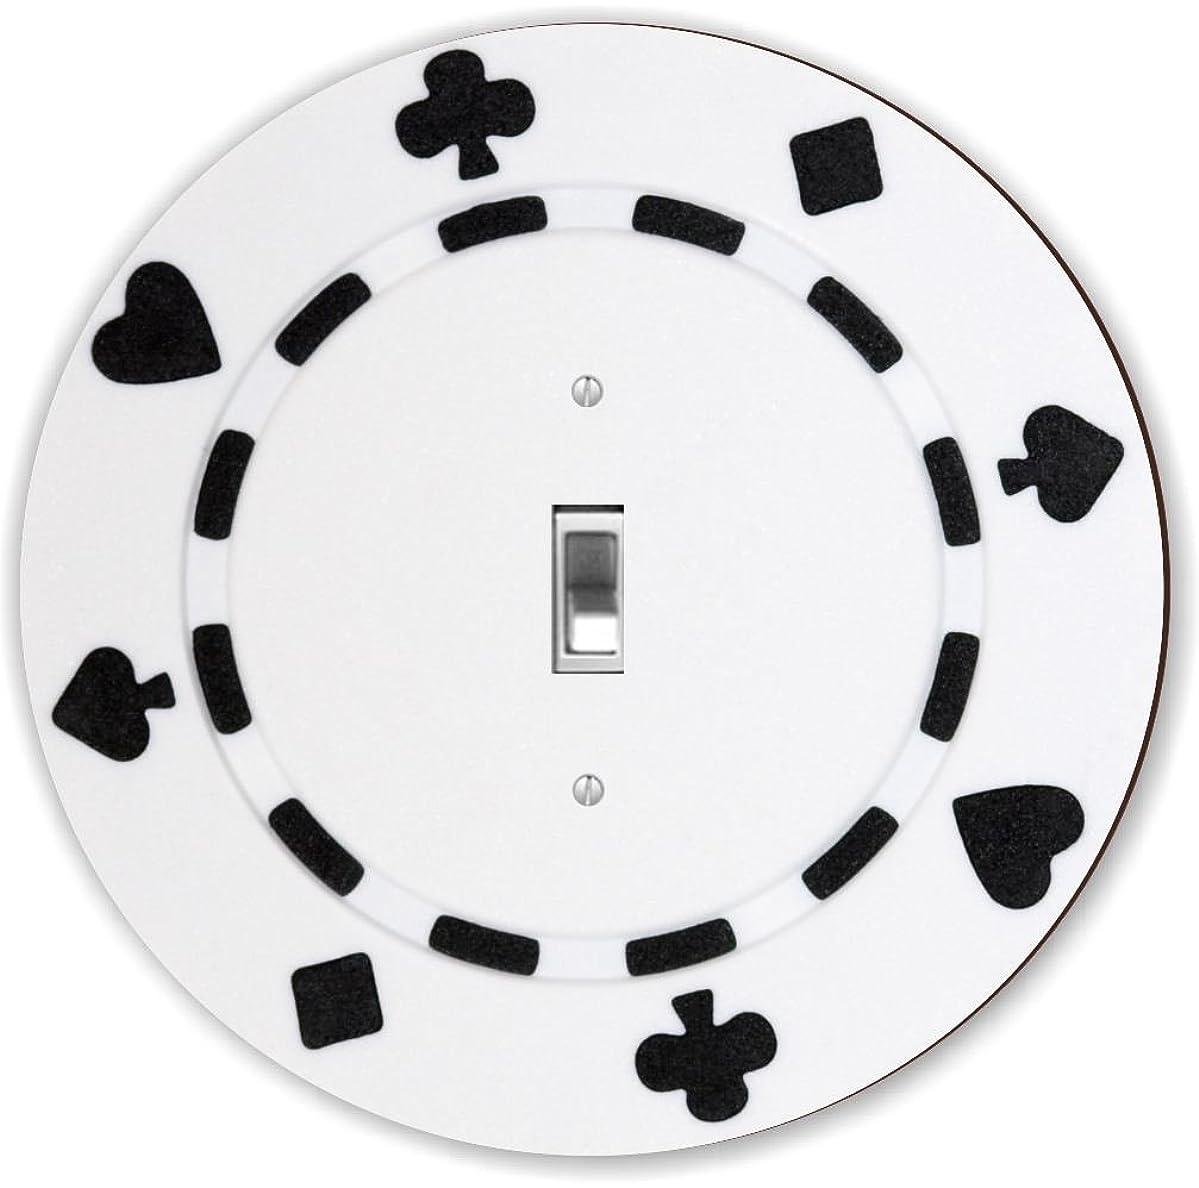 Rikki Knight RND-LSPS-84 Poker Chip Round - Single Toggle Light Switch Plate, White/Black